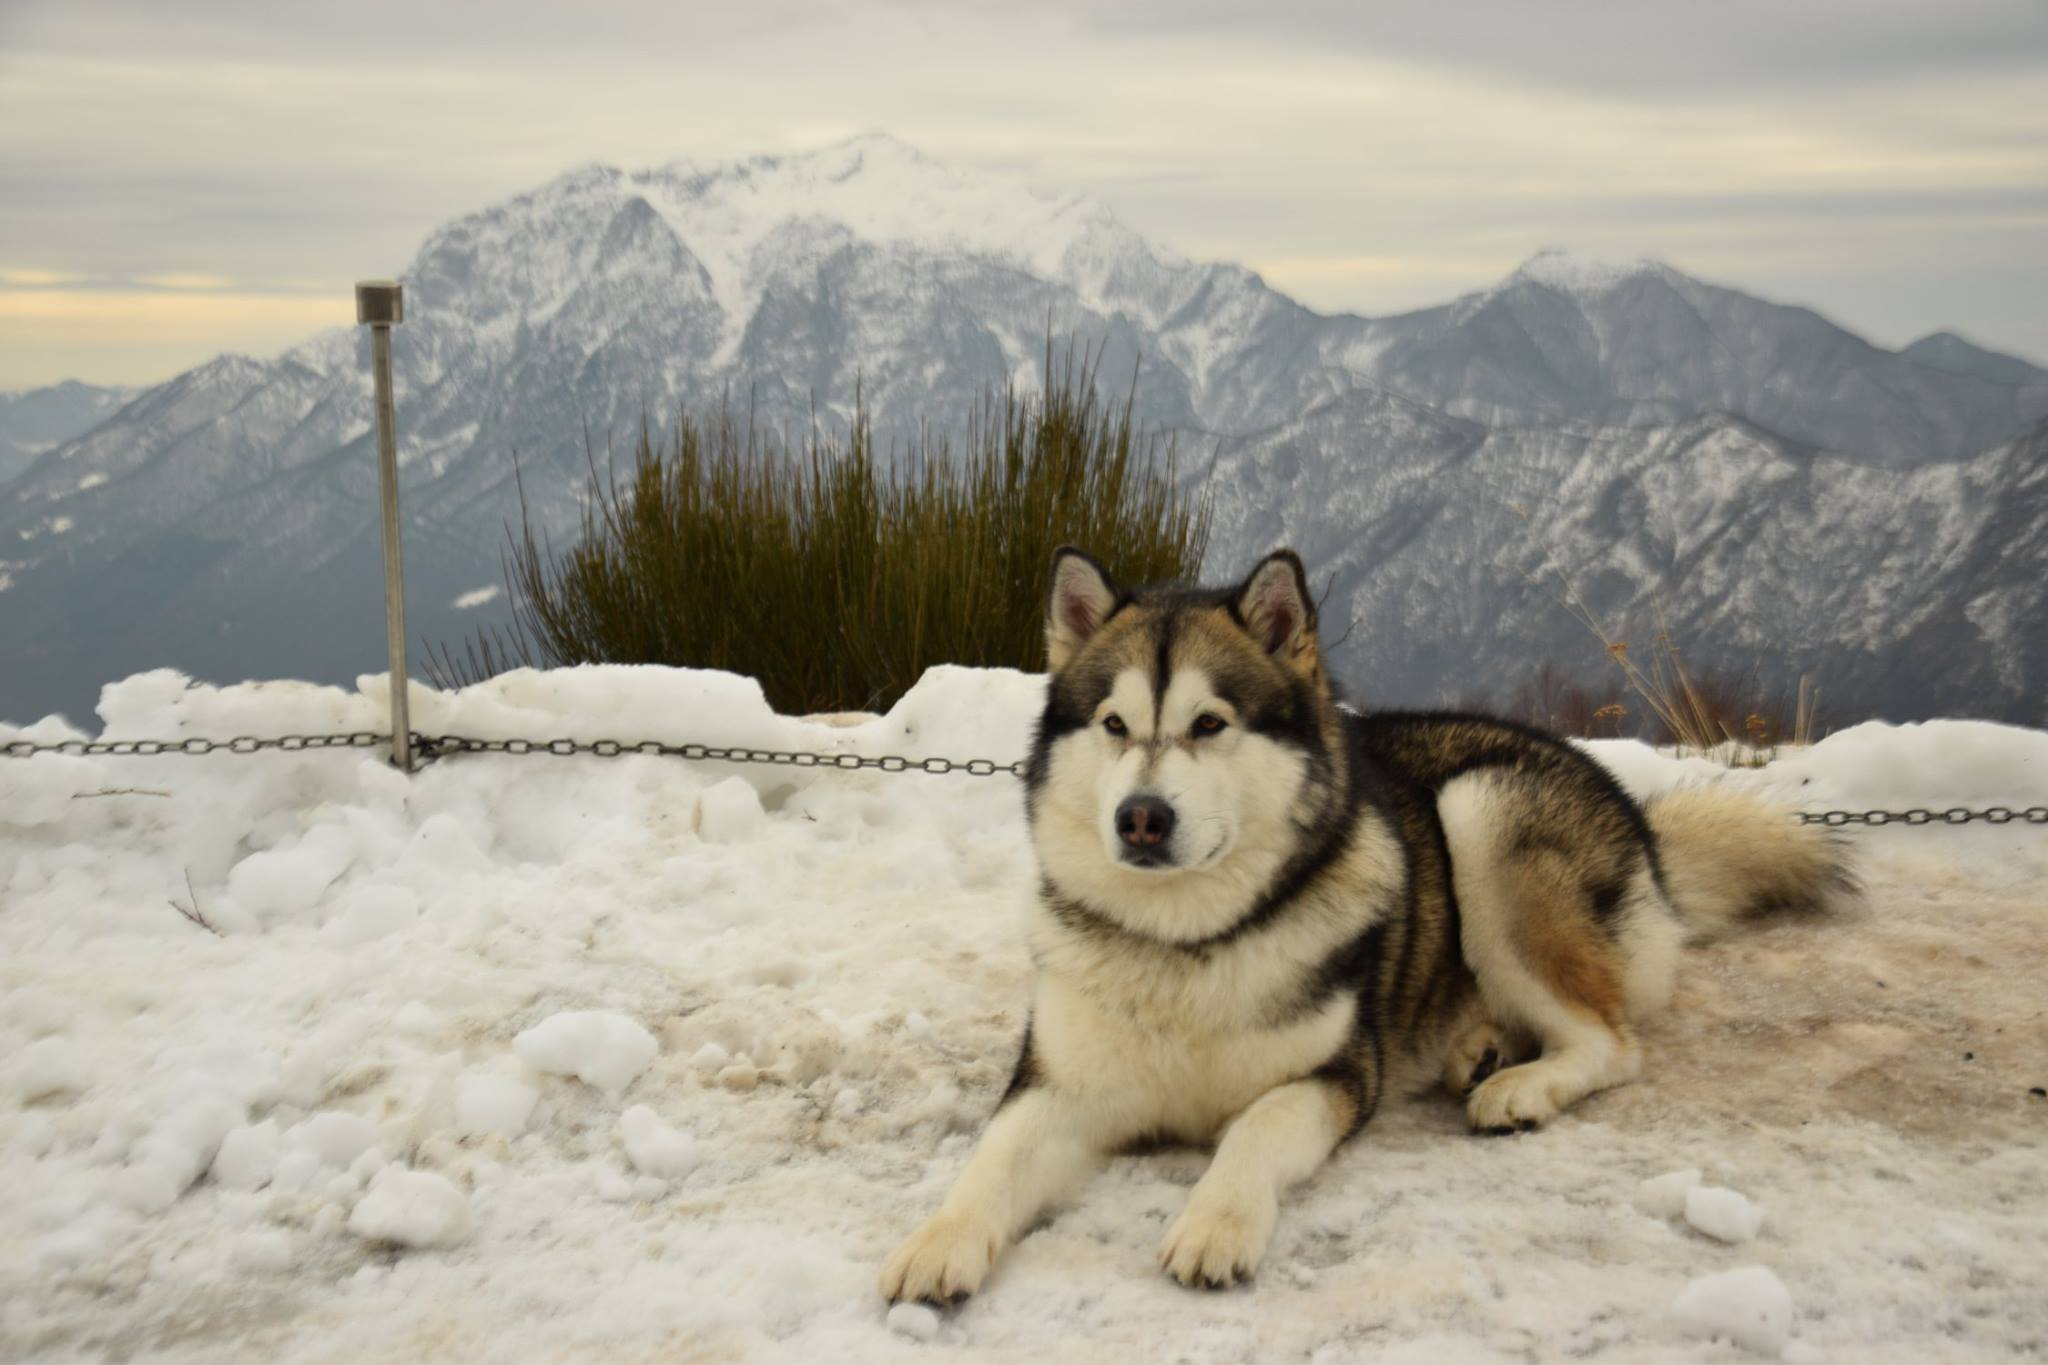 XV Alaskan Malamute Sleddog Day a Casargo